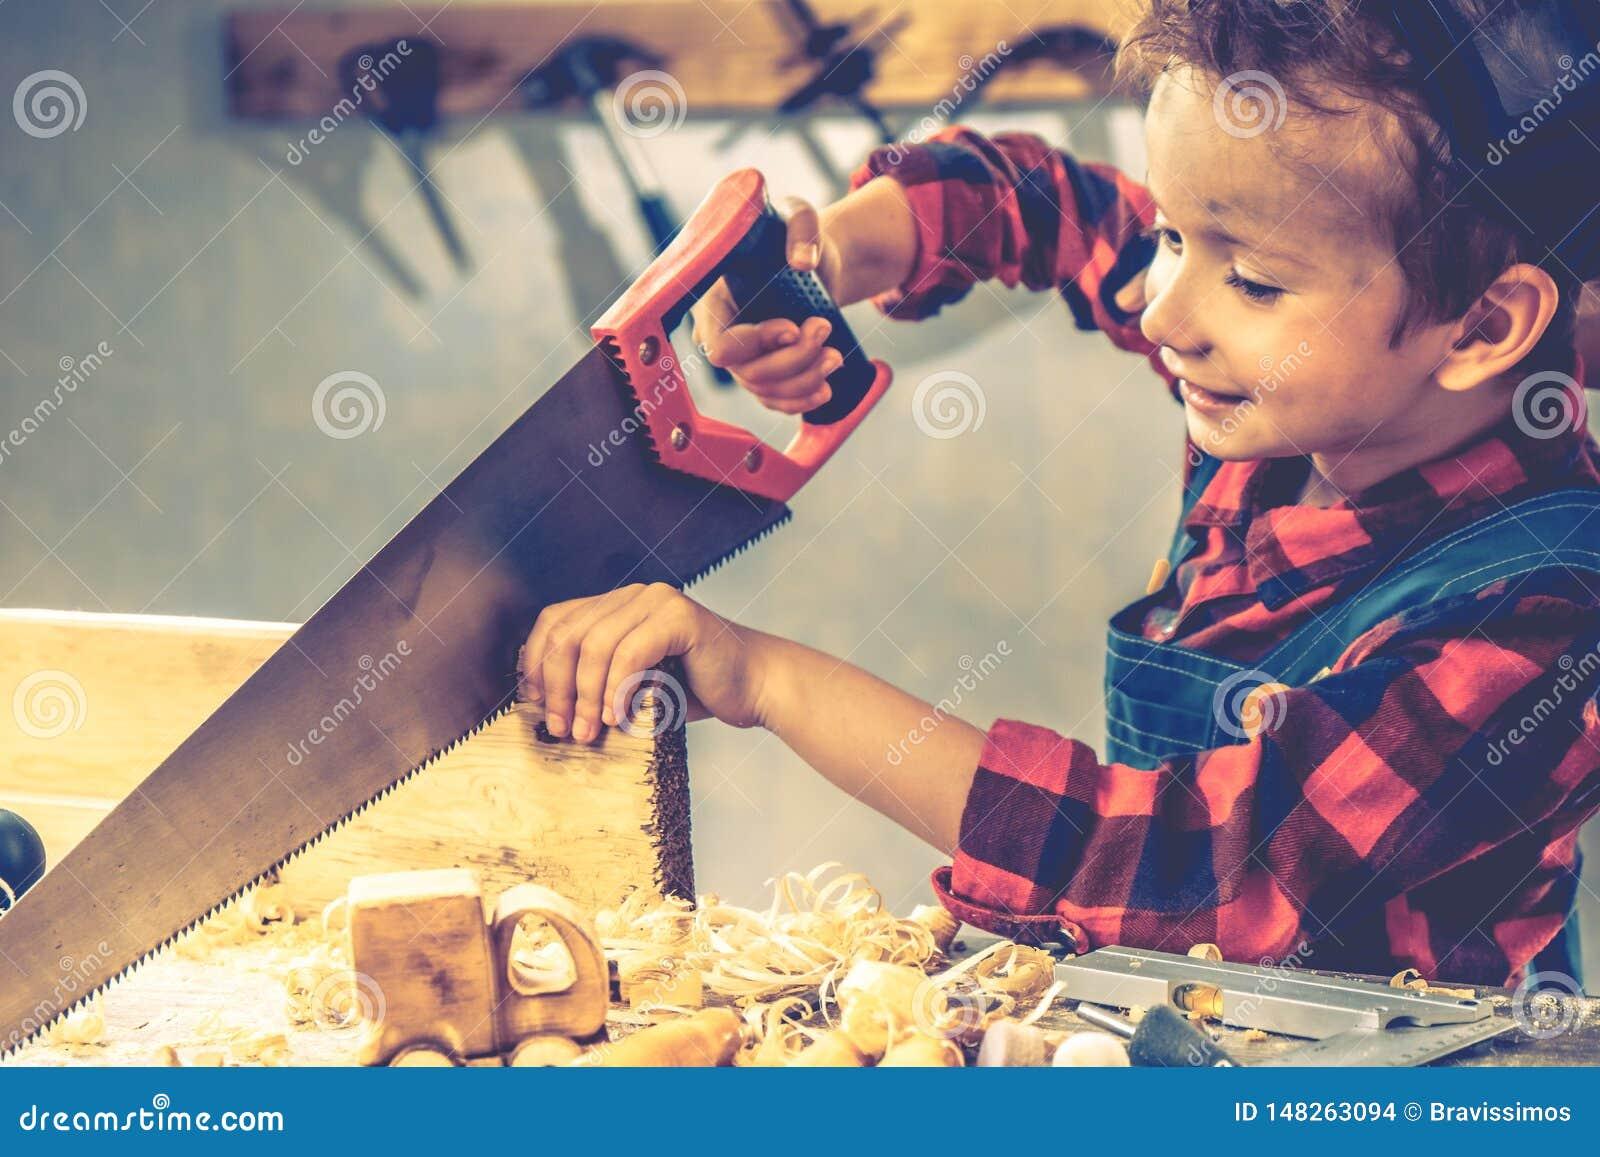 Концепция дня отцов ребенка, инструмент плотника, дом мальчика